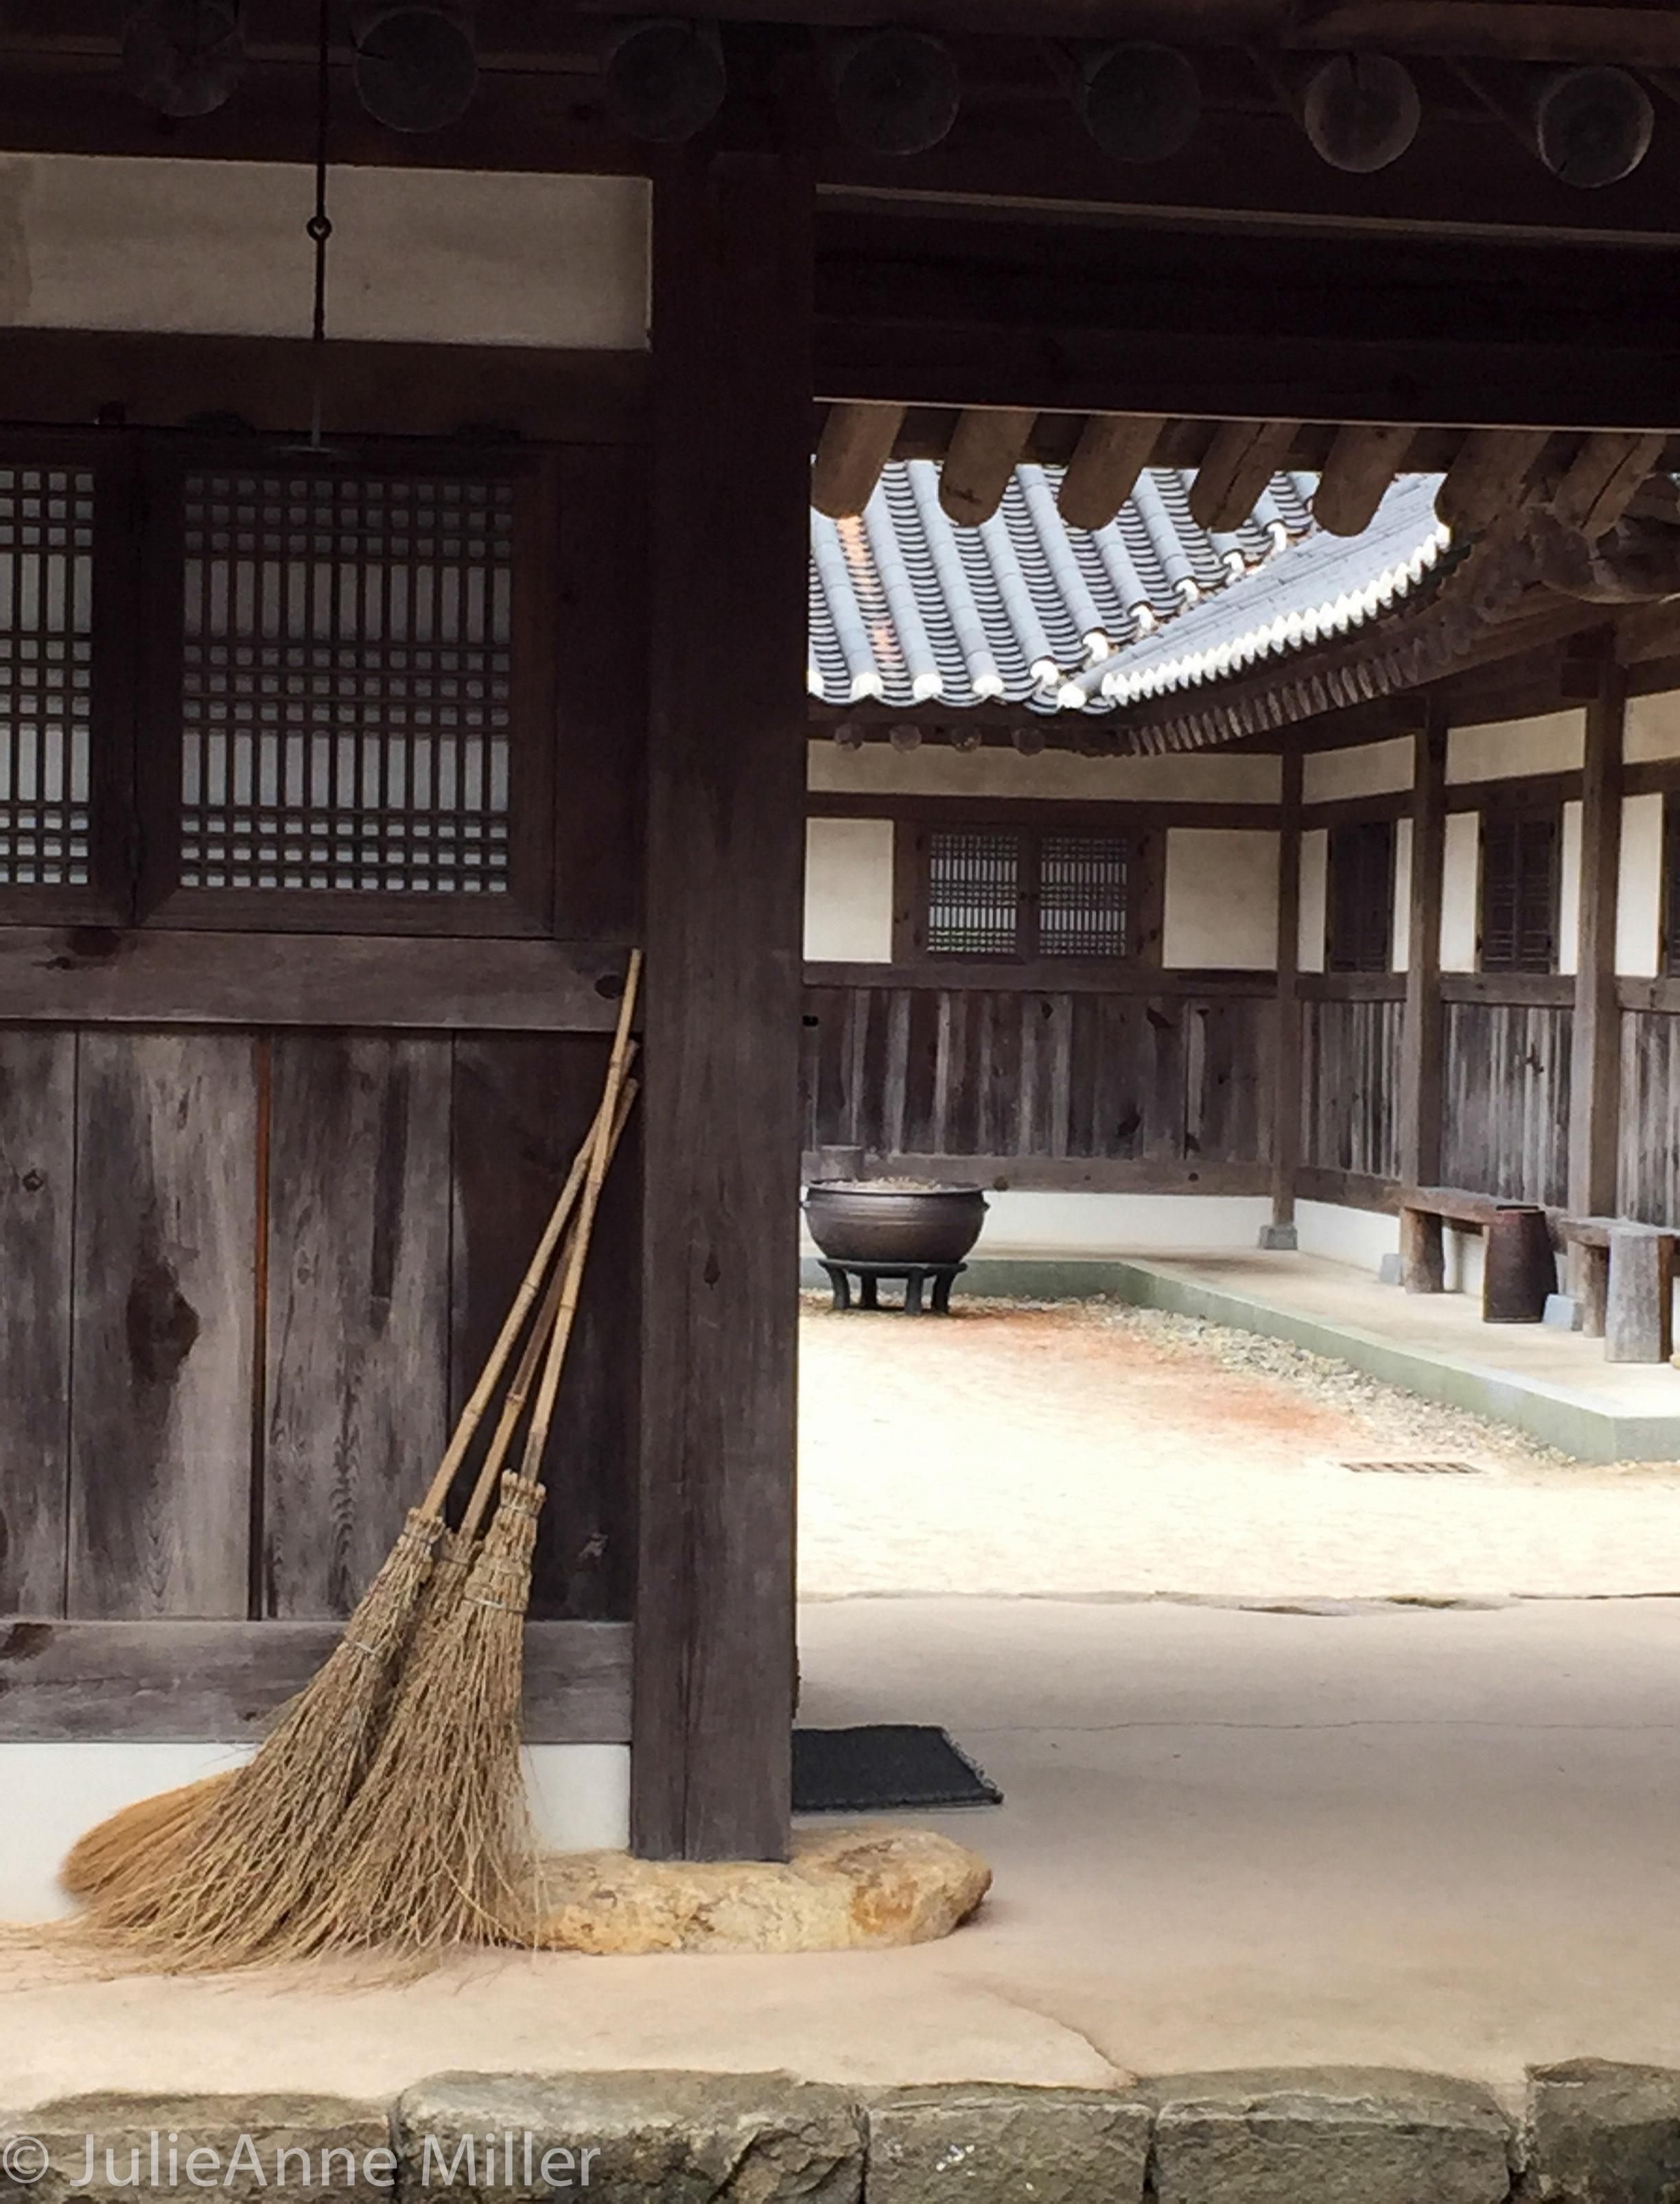 Sunchon Wild Tea House, South Korea